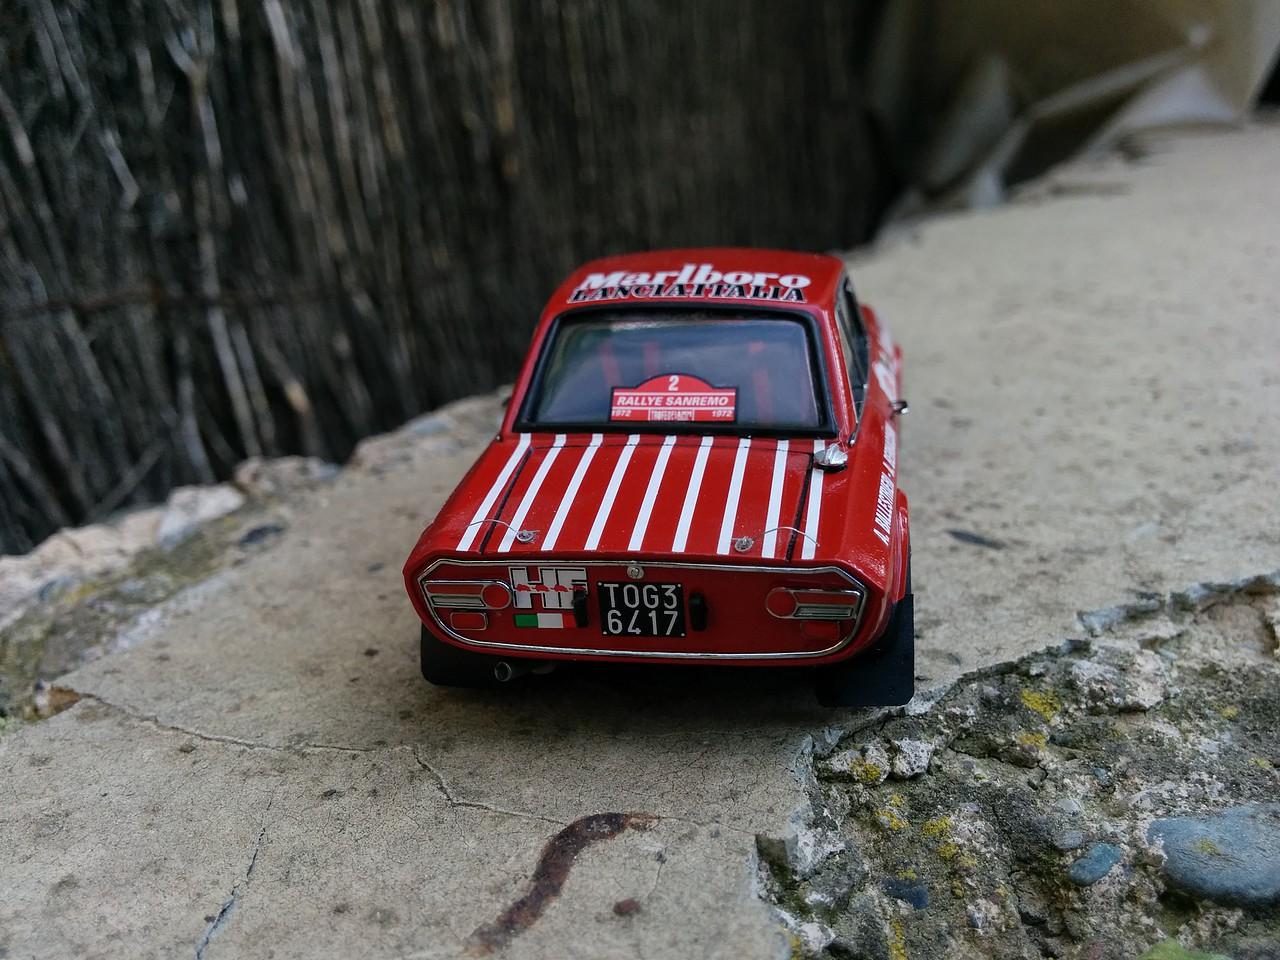 Lancia Fulvia San Remo 72. Racing 43 a escala 1/43 22540003C72F537202A63B5372028E